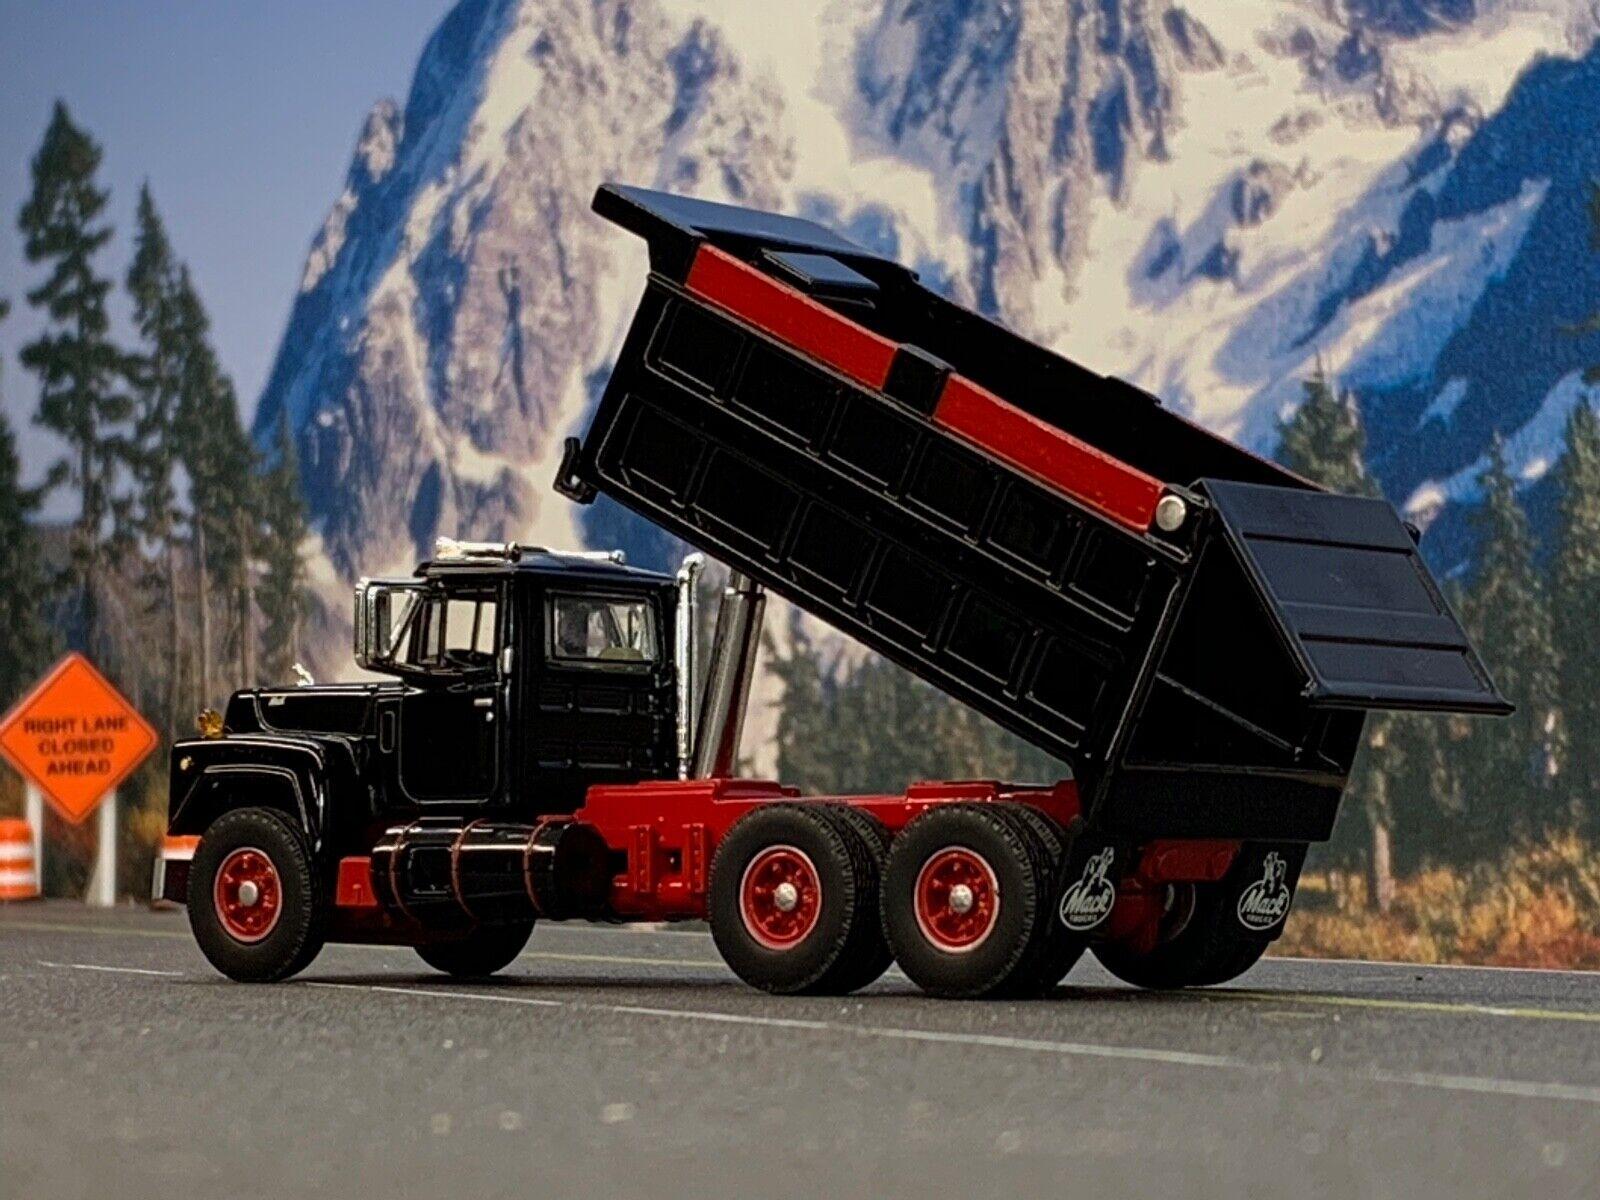 1/64 DCP FIRST GEAR BLACK/RED MACK R DUMP TRUCK 2